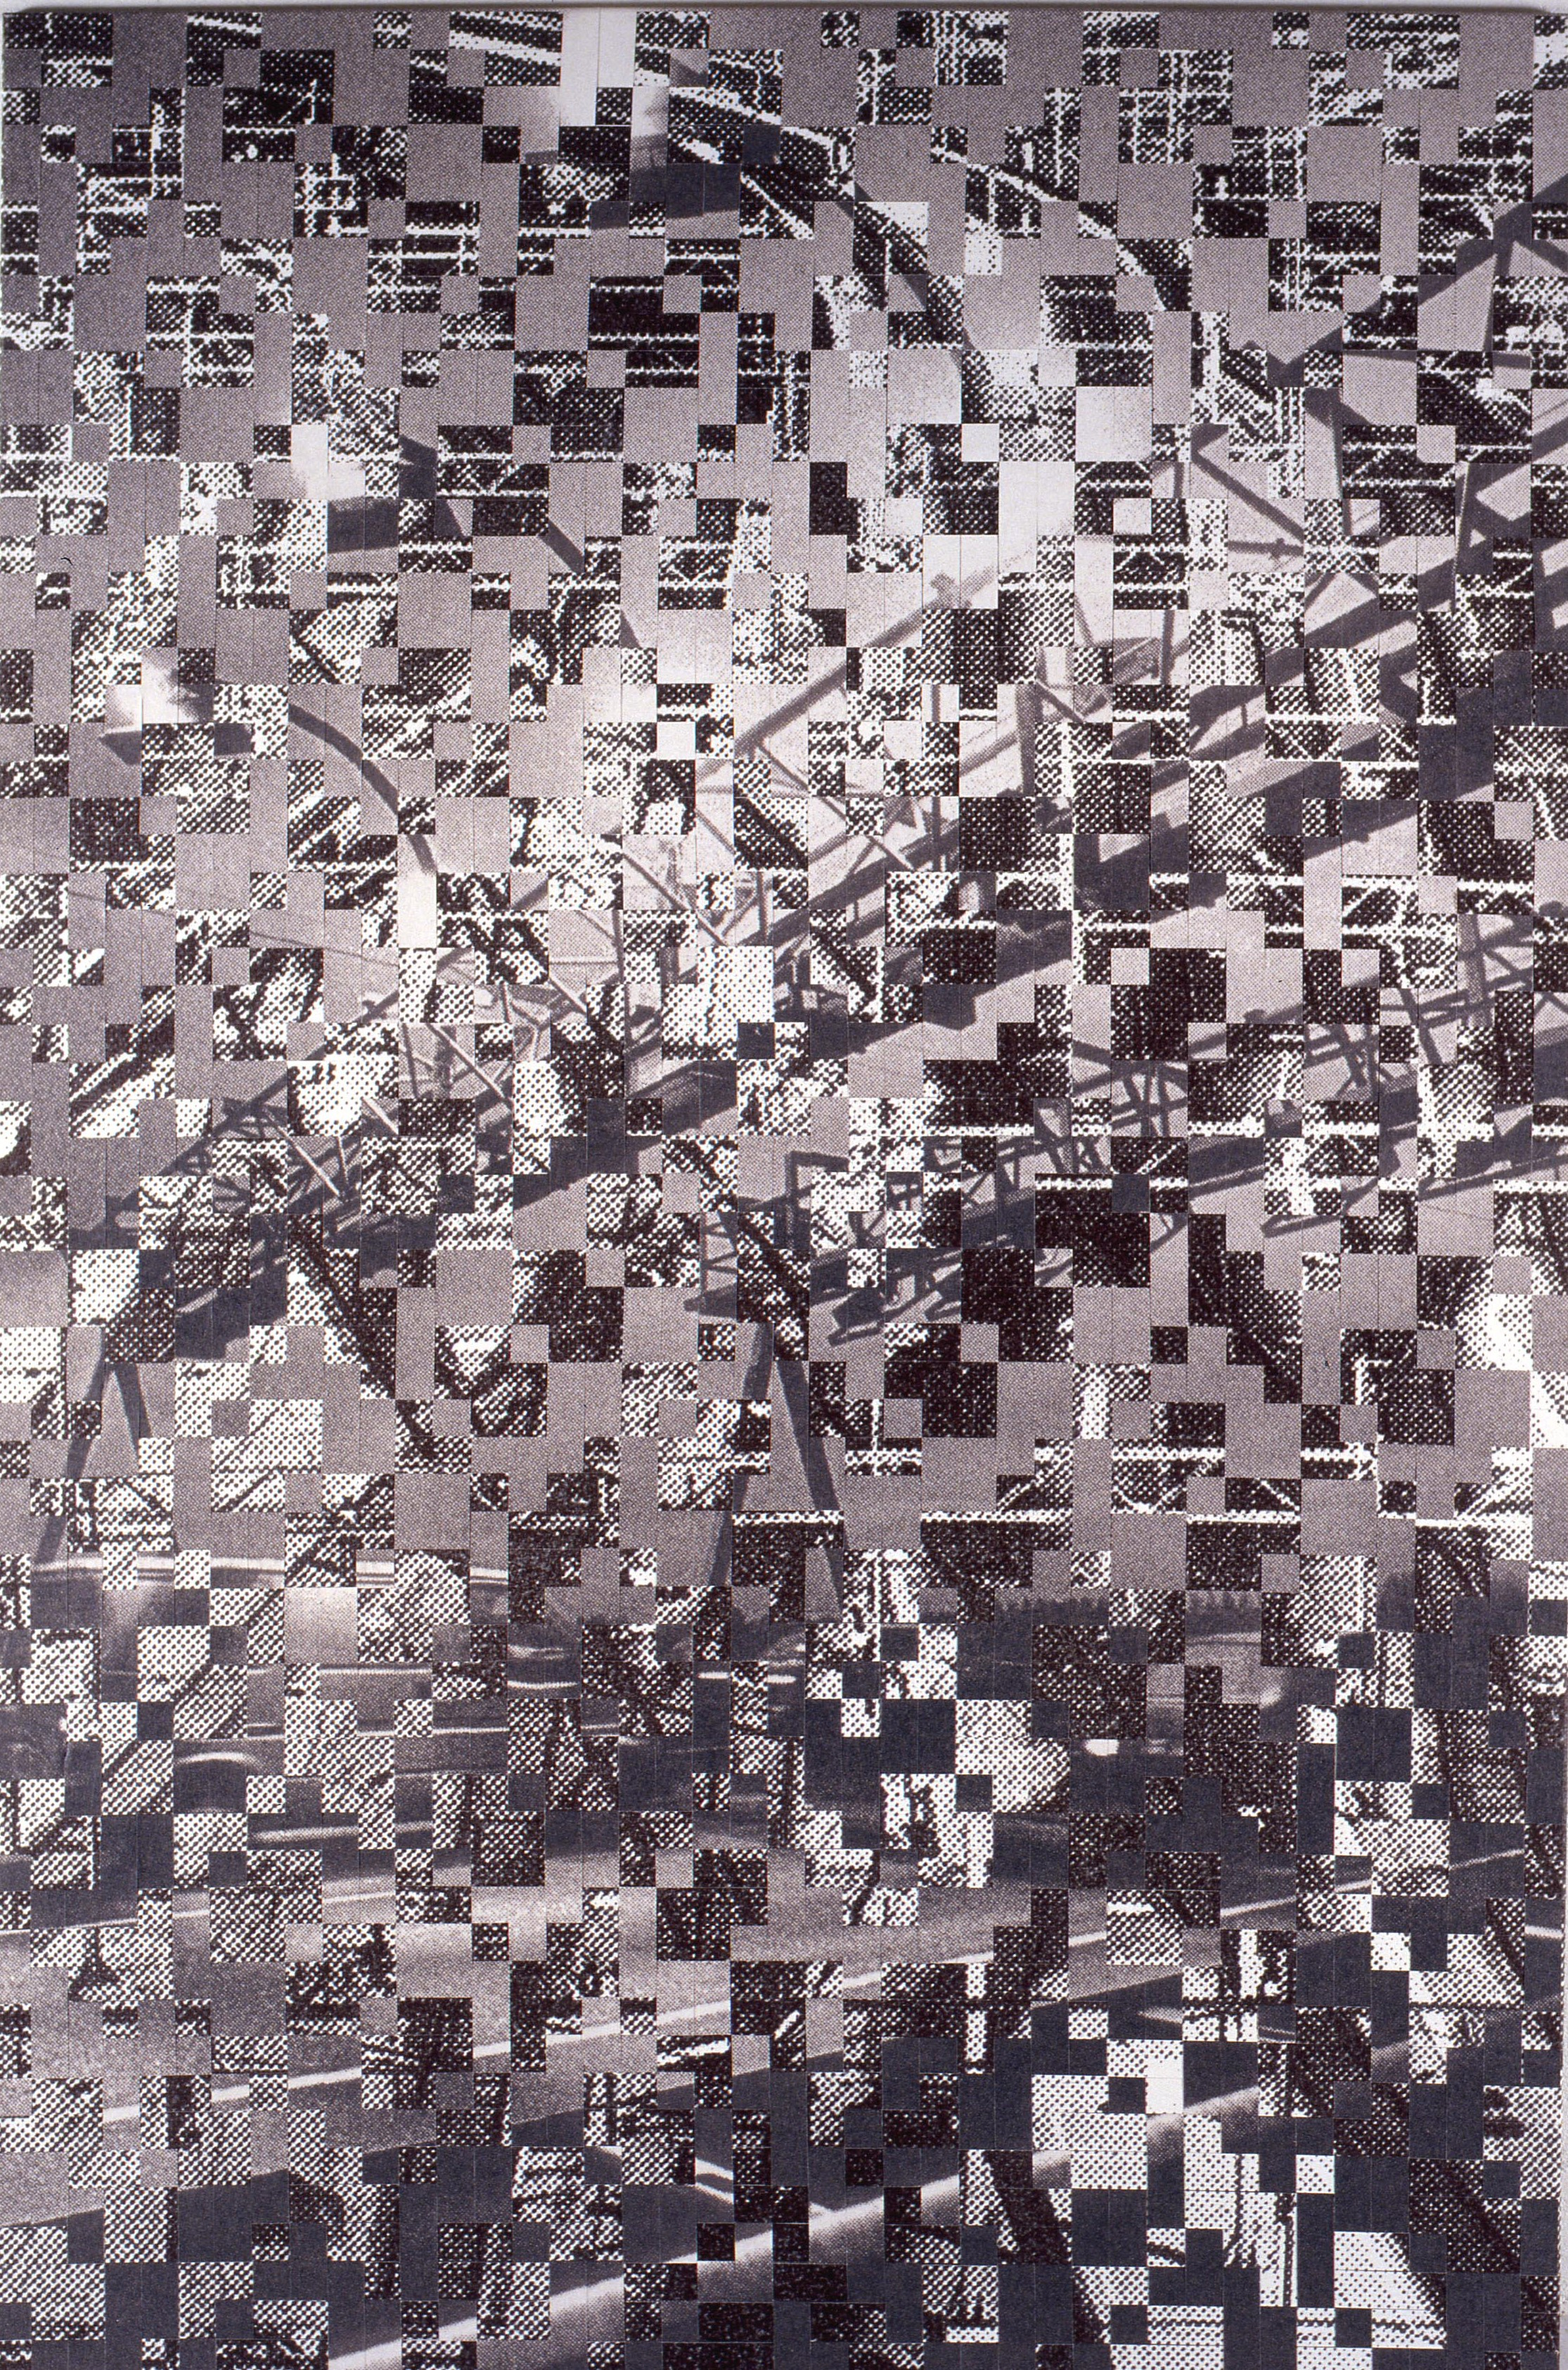 Dutch landscape no. 10, printed and woven canvas, 250 x 180 cm